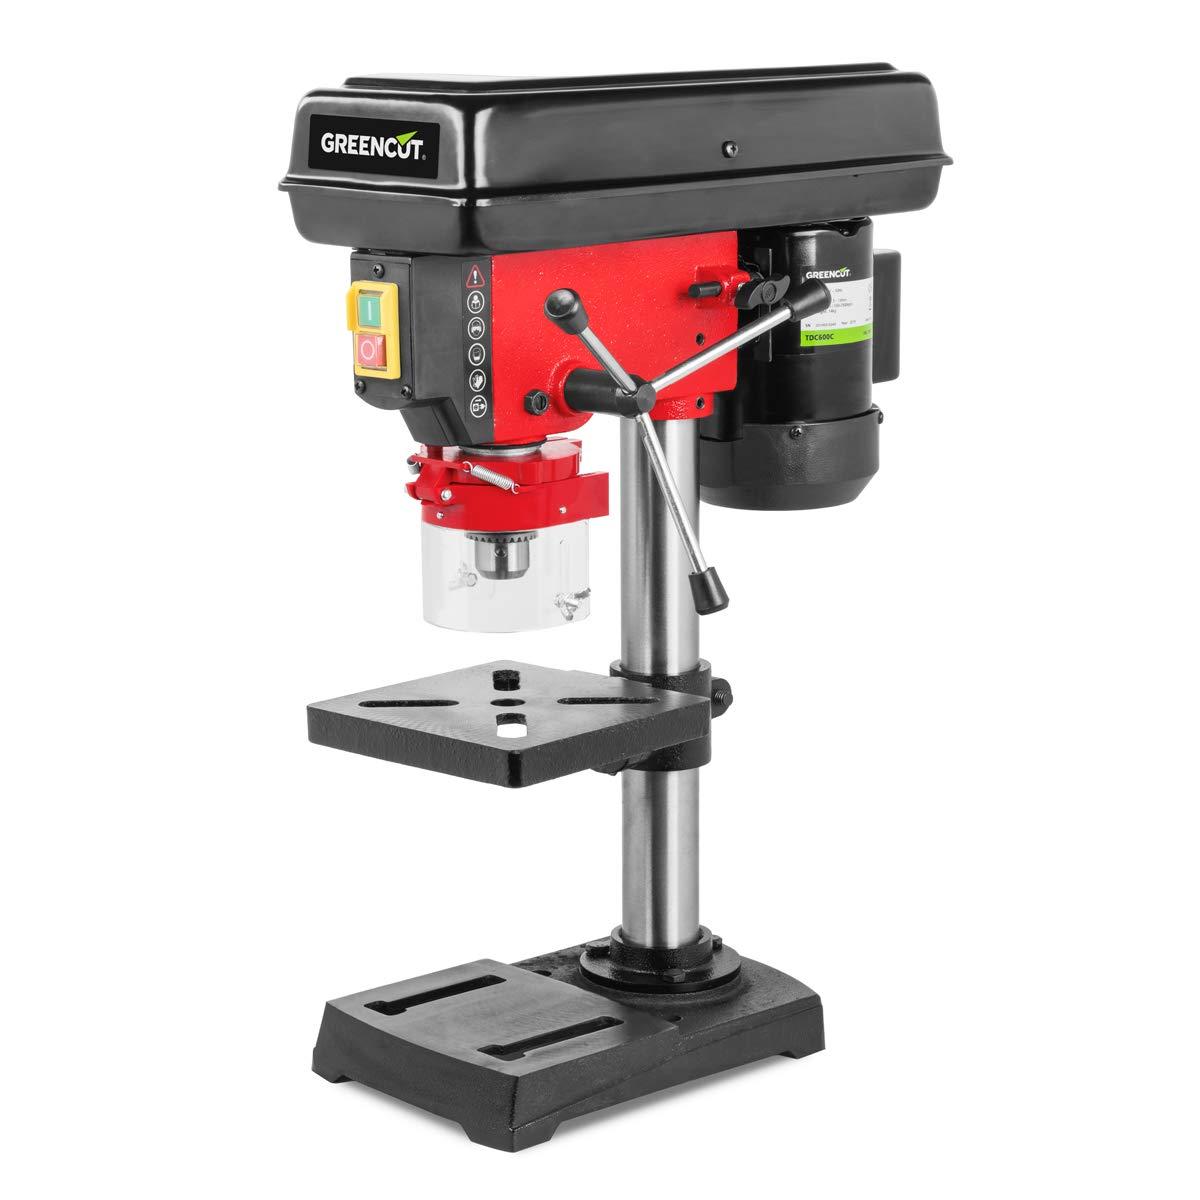 Greencut 8435574309204 Perceuse colonne 600 W Puissance 5 vitesses 50 mm perforation rouge